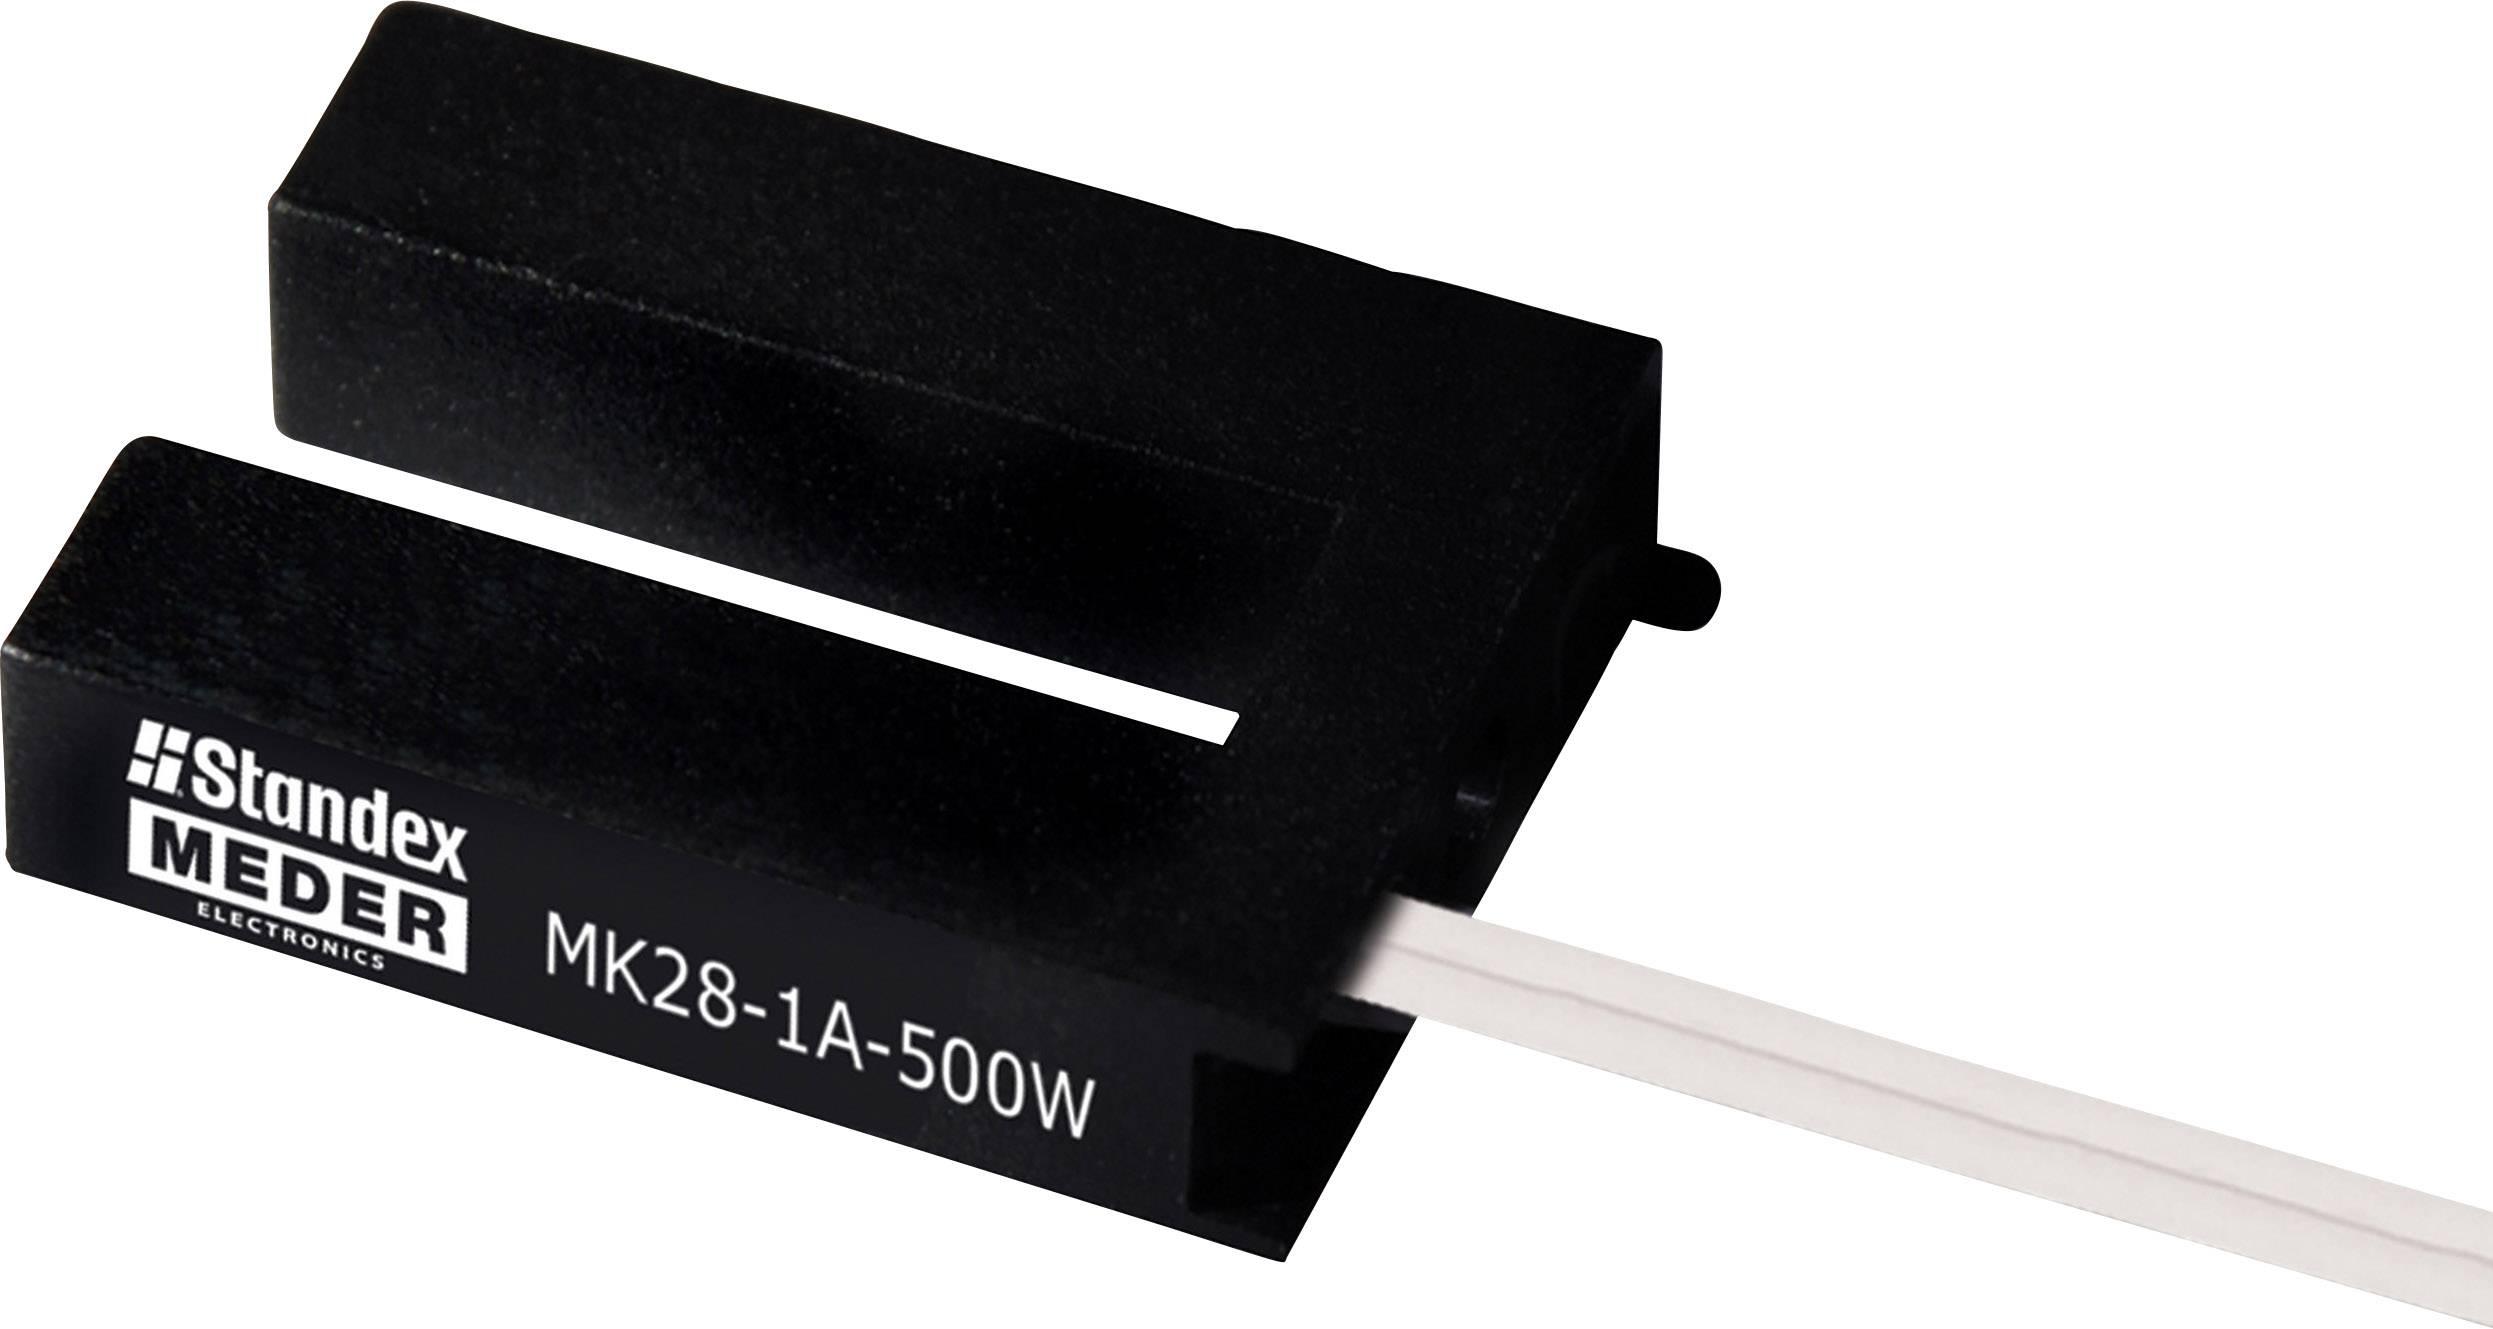 Jazyčkový kontakt StandexMeder Electronics 9282661054, 1 rozpínací, 175 V/DC, 175 V/AC, 1 A, 10 W